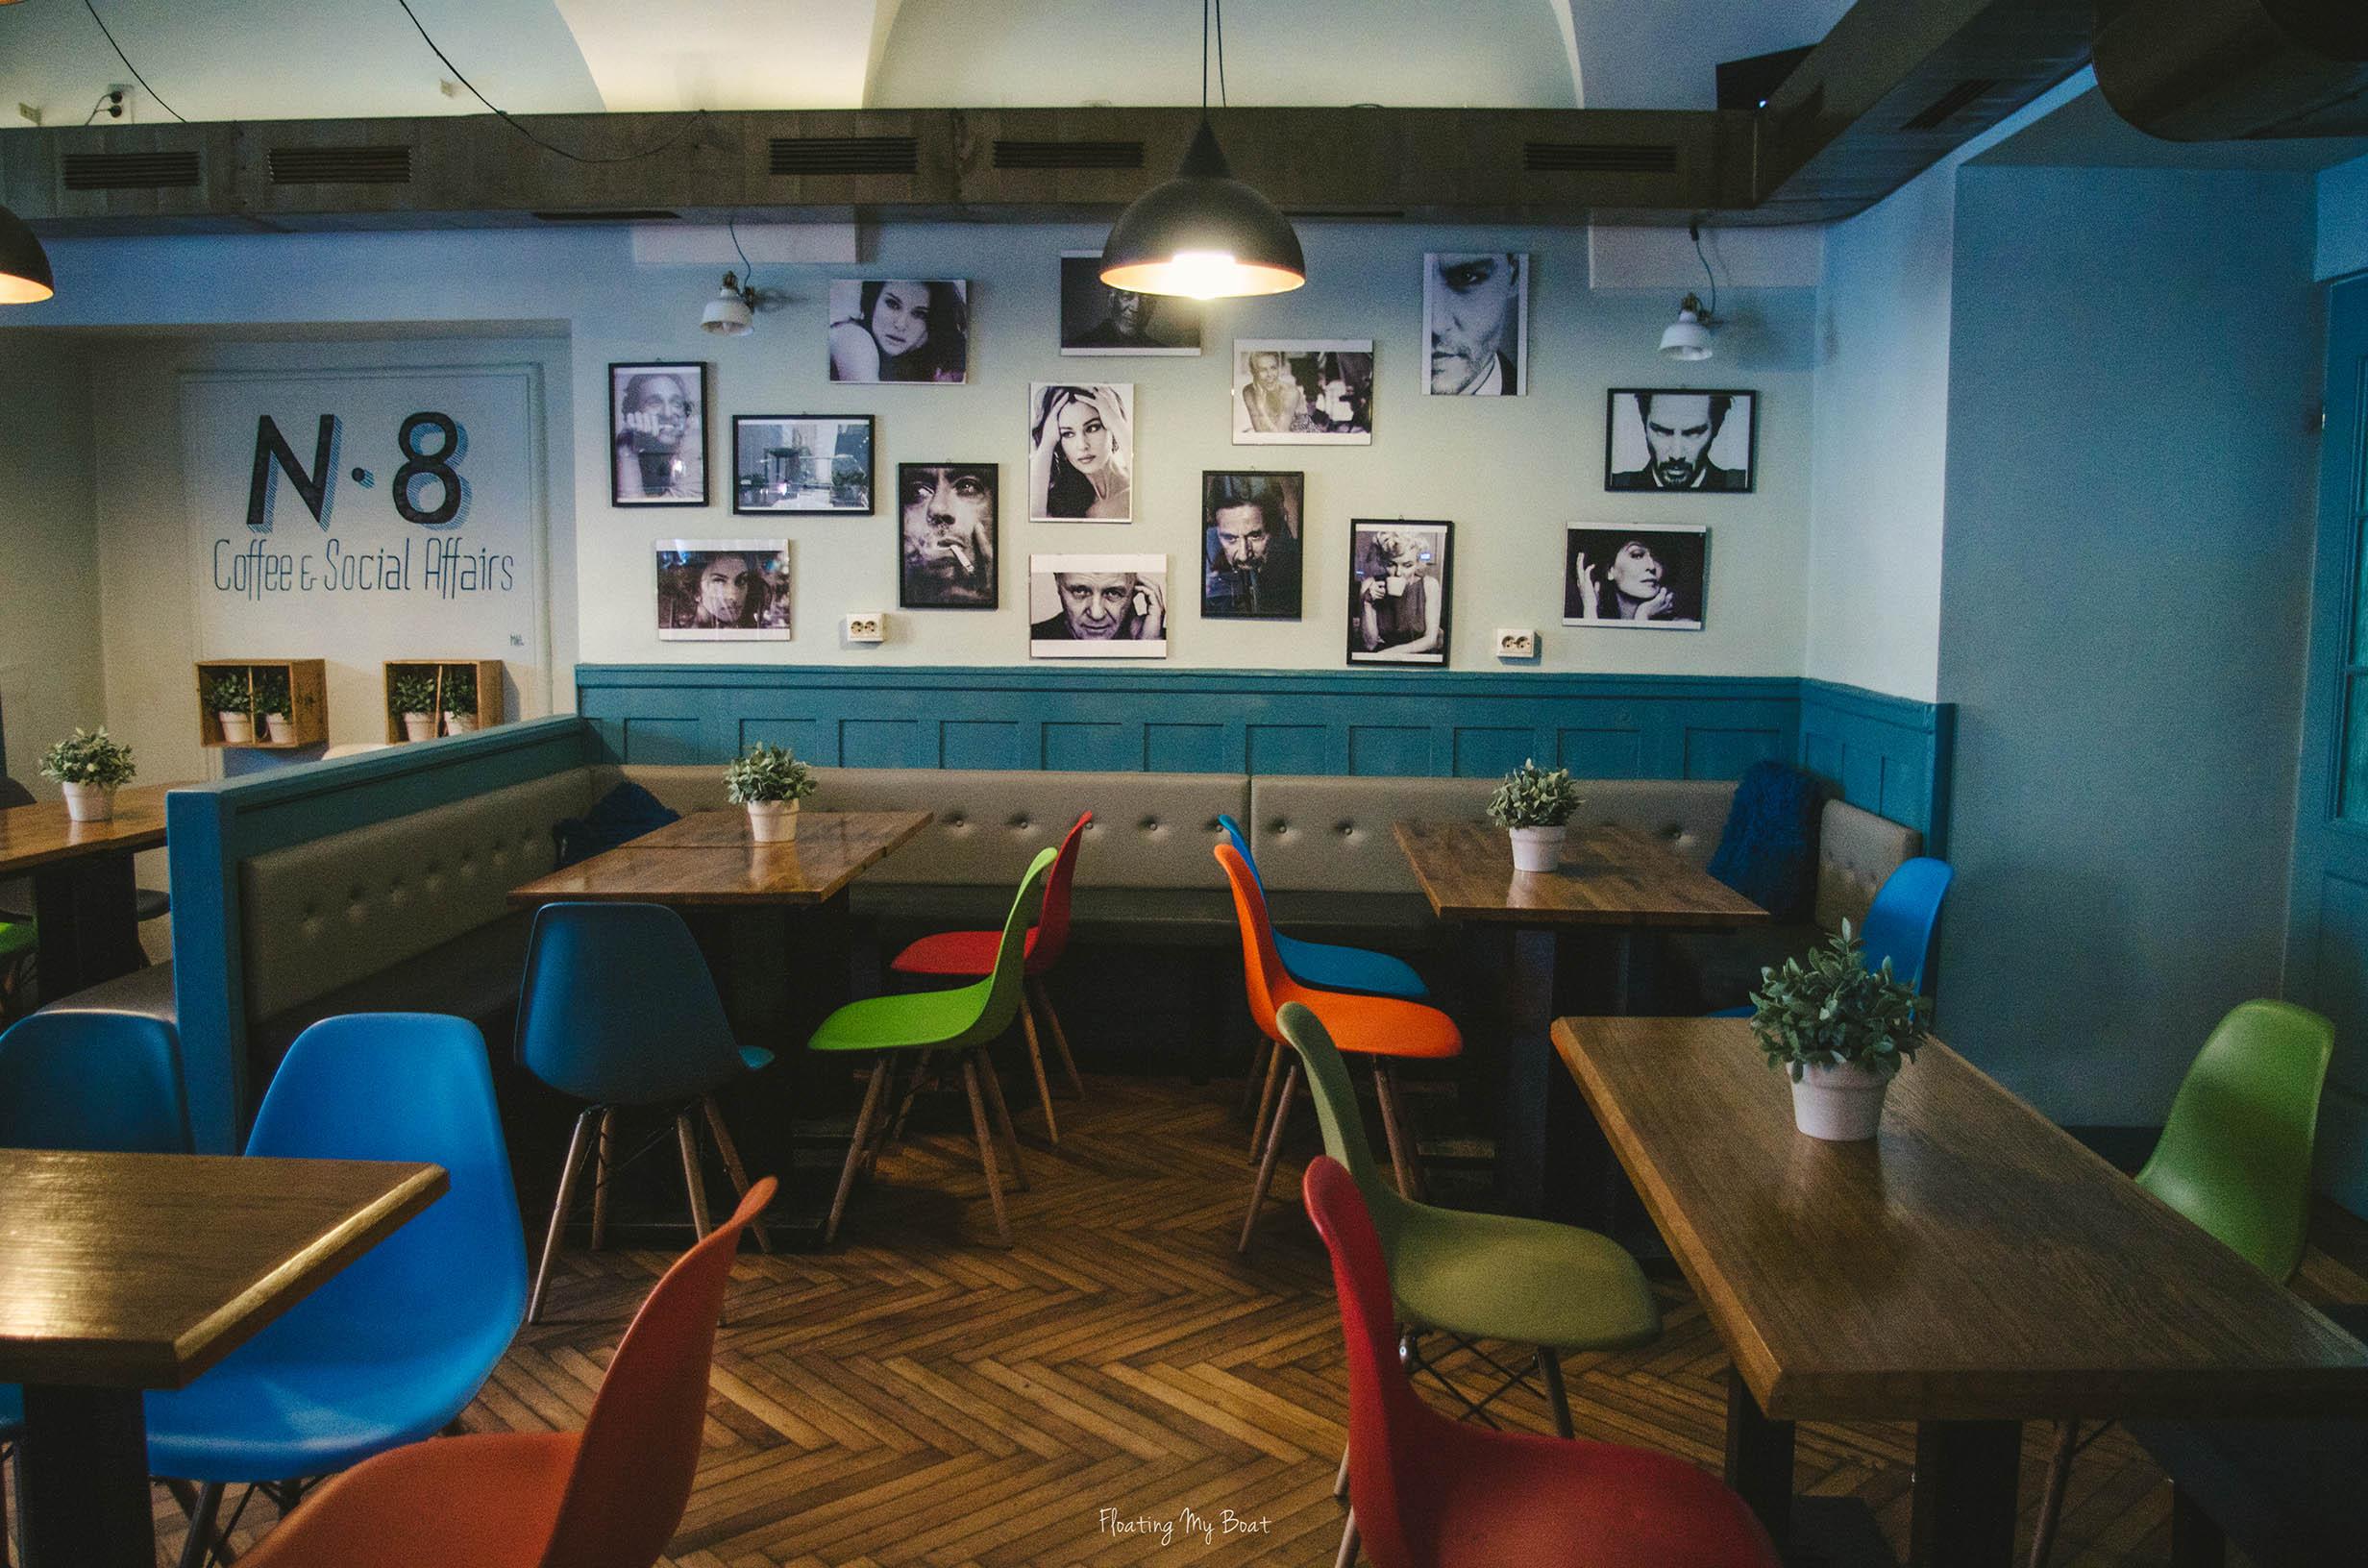 best-cafes-cluj-napoka-social-affairs